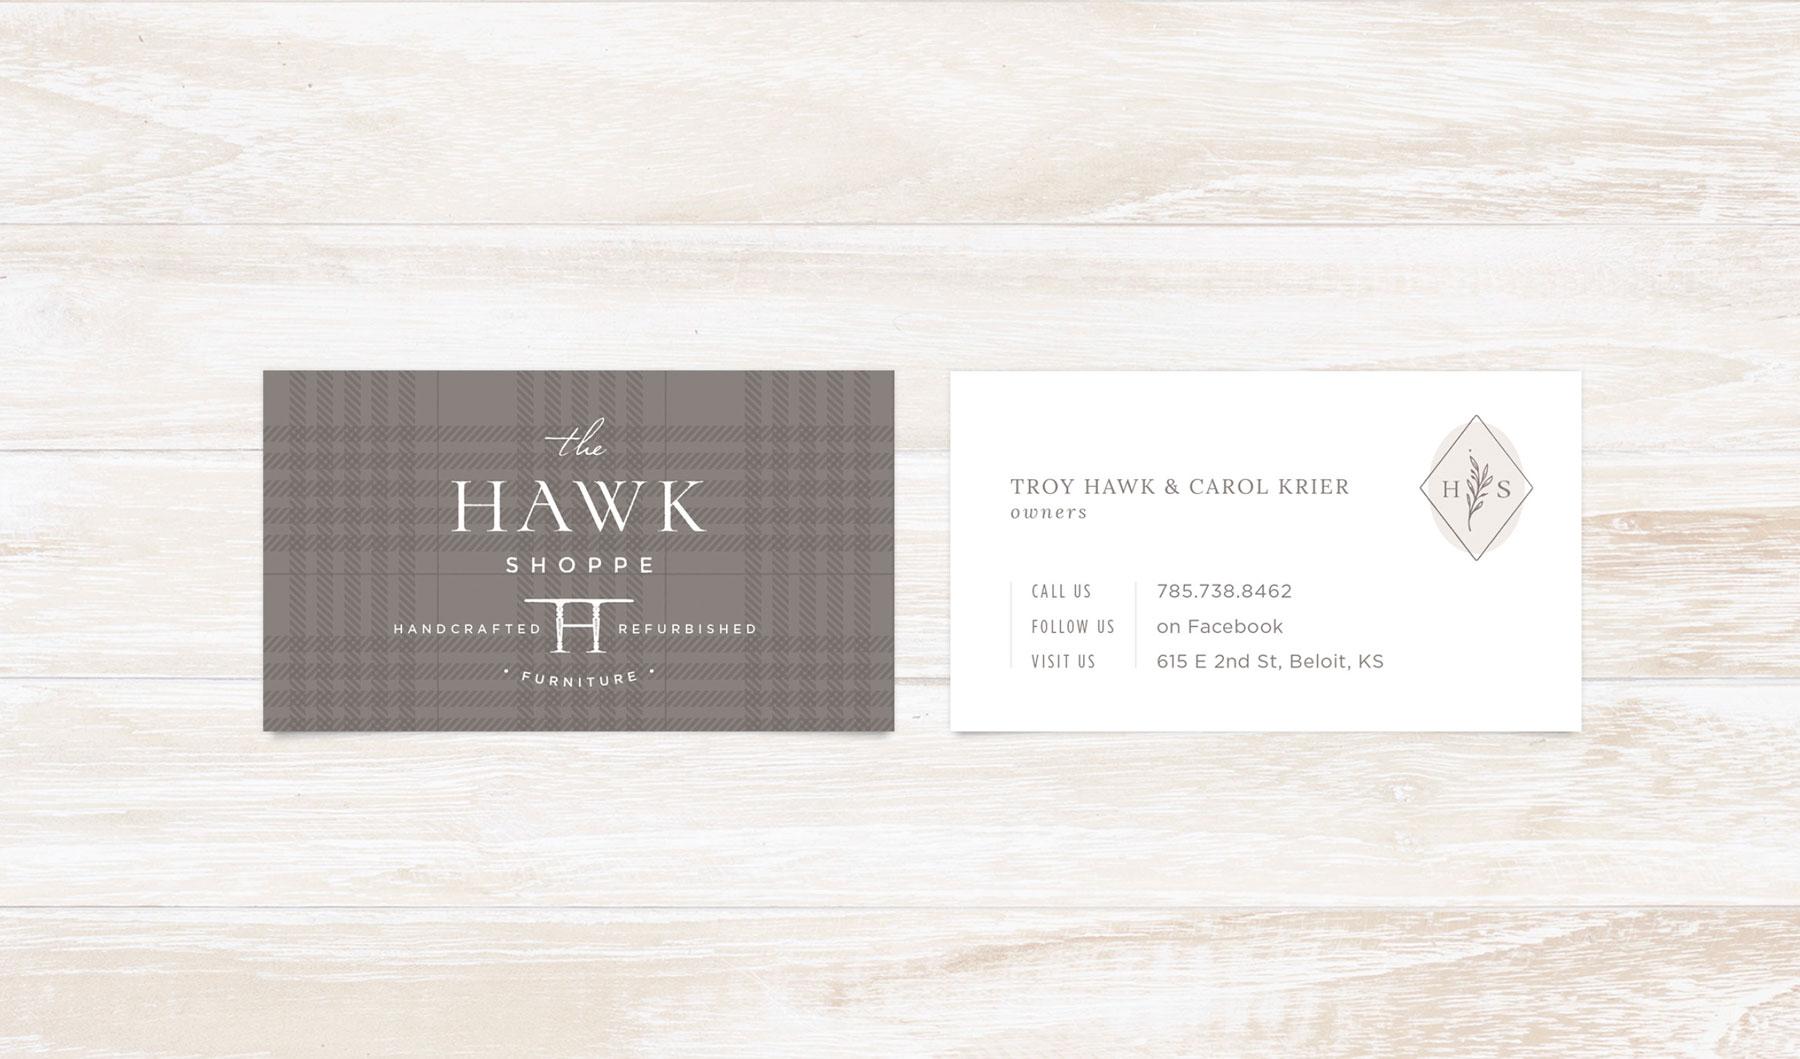 TheHawkShoppe_Logo_BusinessCardDesign_06.jpg